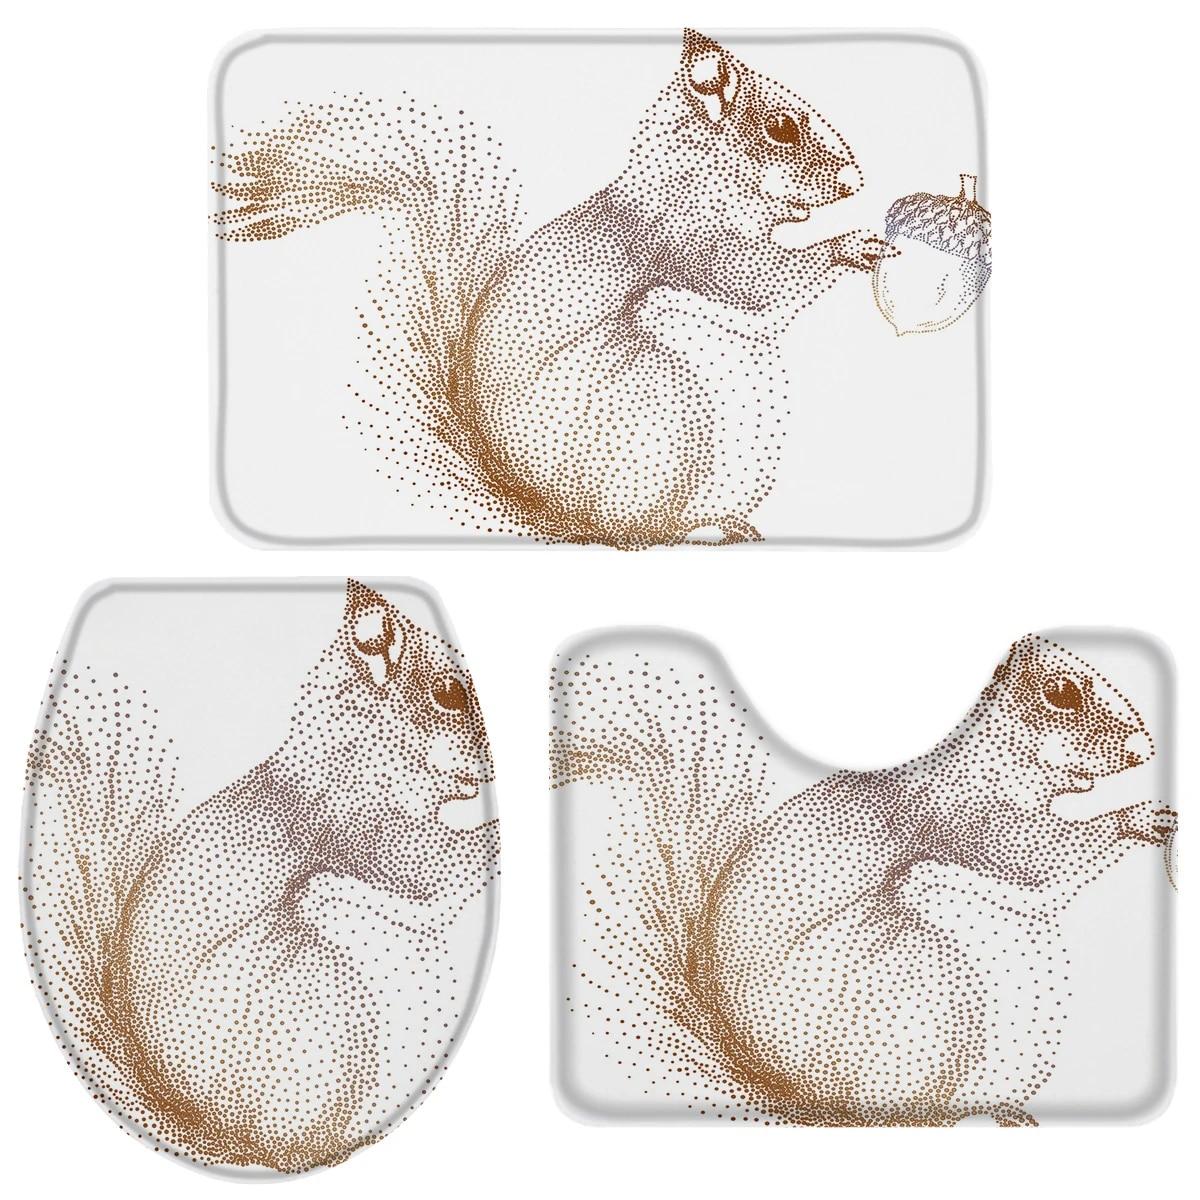 Squirrel Pine Cone Animal Polka Dot Bath Set Toilet Cover Mat Pedestal Rug Non Slip Bathroom Rug Set Bathroom Accessories Sets Aliexpress